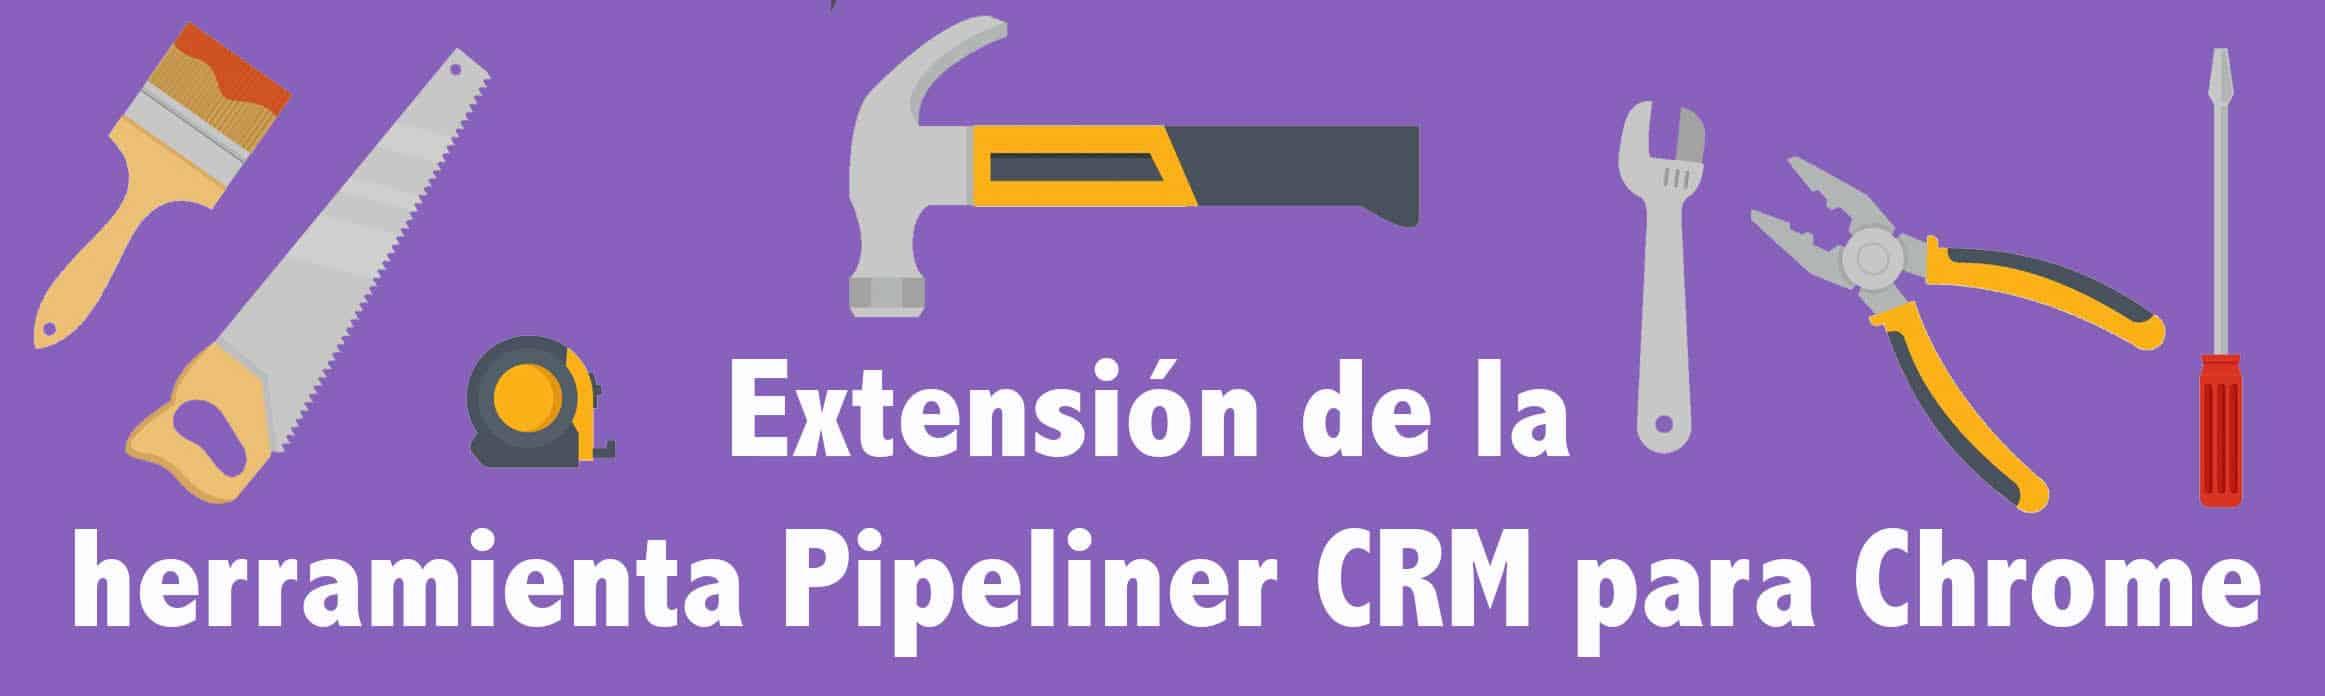 herramienta pipeliner crm